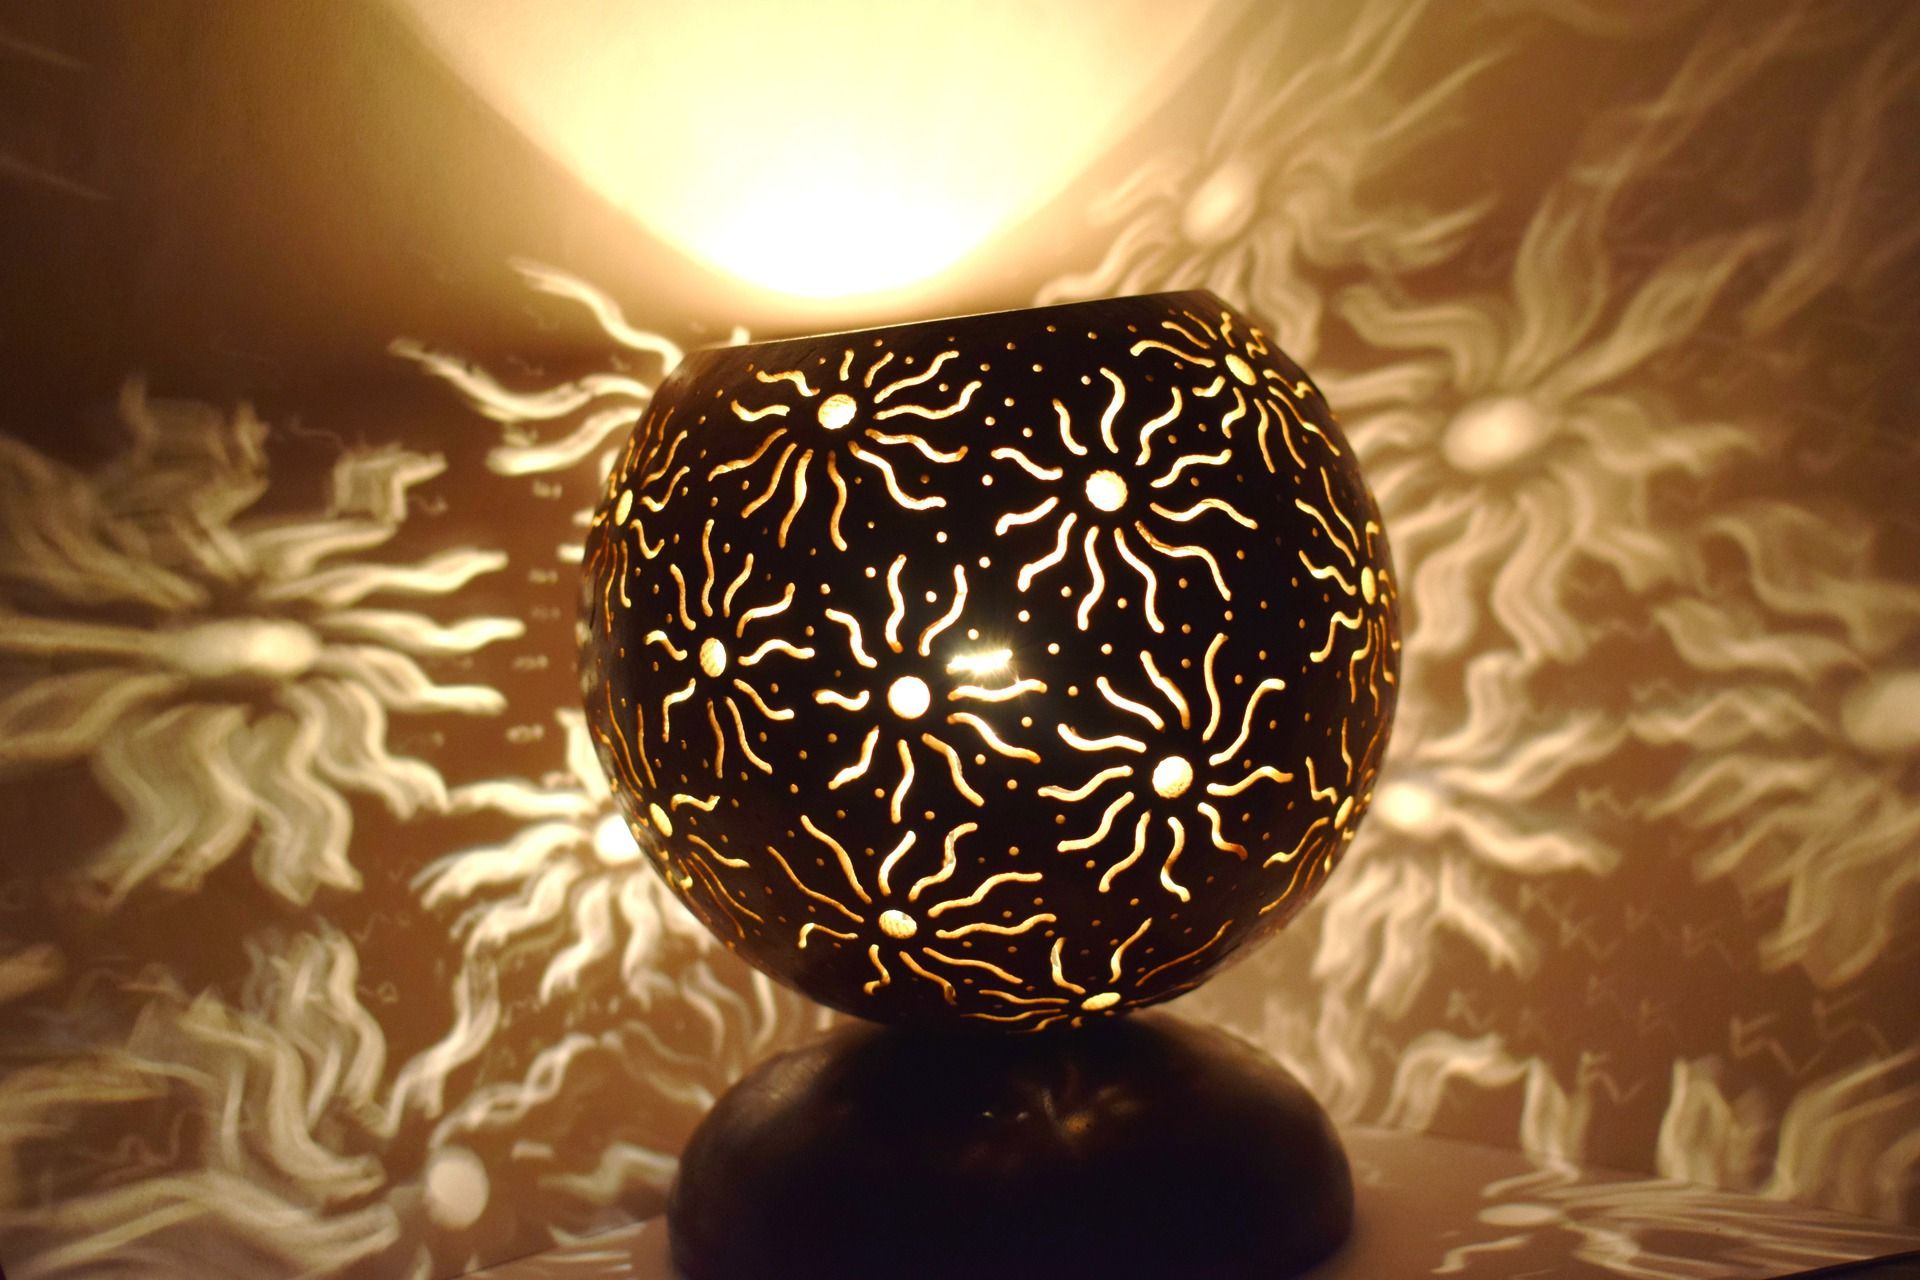 Solaris Lampe D Ambiance Stellaire En Calebasse Sculptee Su Kabagi Lamba Sus